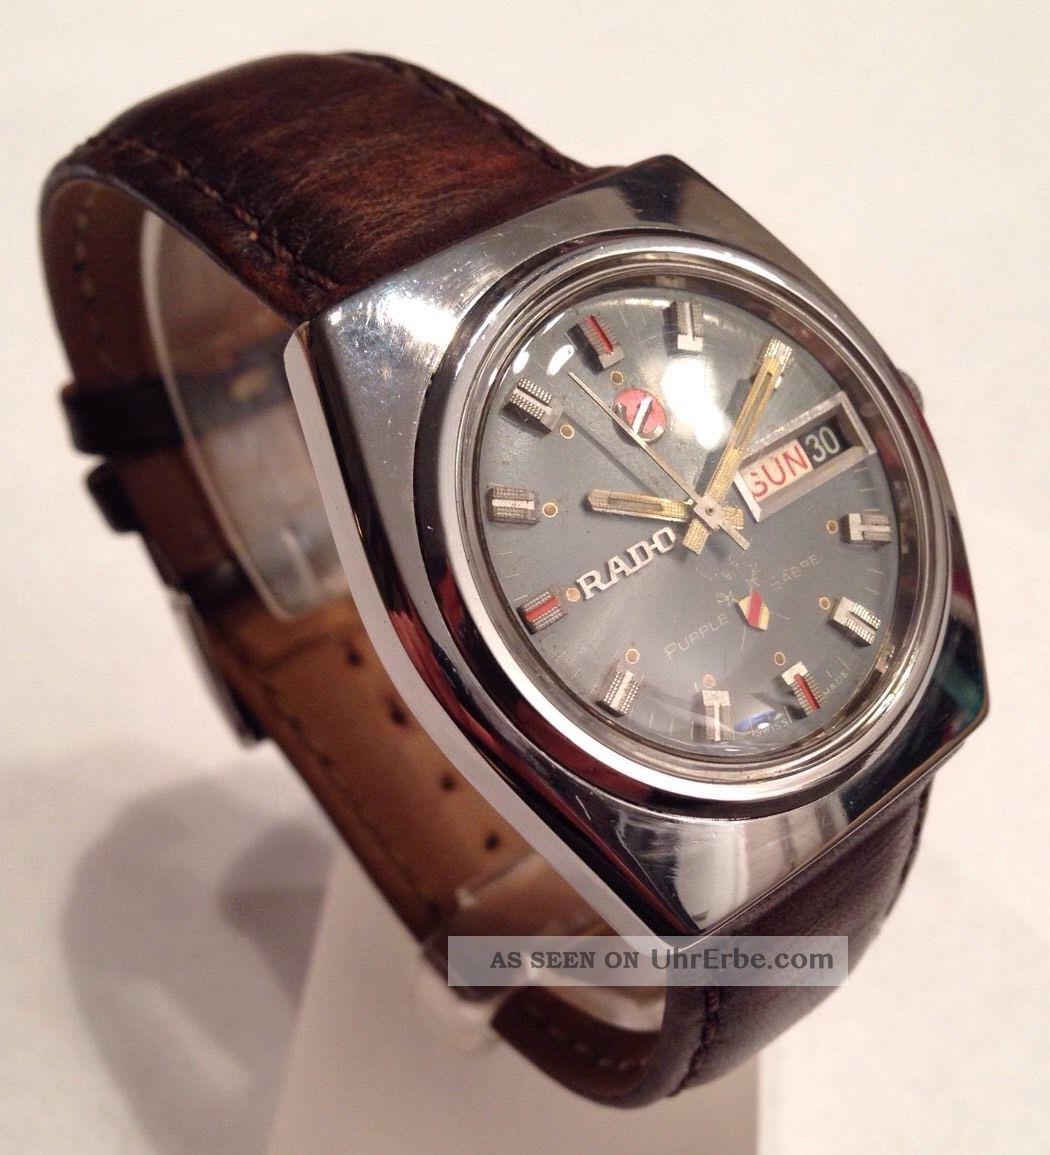 Rado Purple Sabre Automatik Tages - Datumsanzeige Generalüberholt Armbanduhren Bild